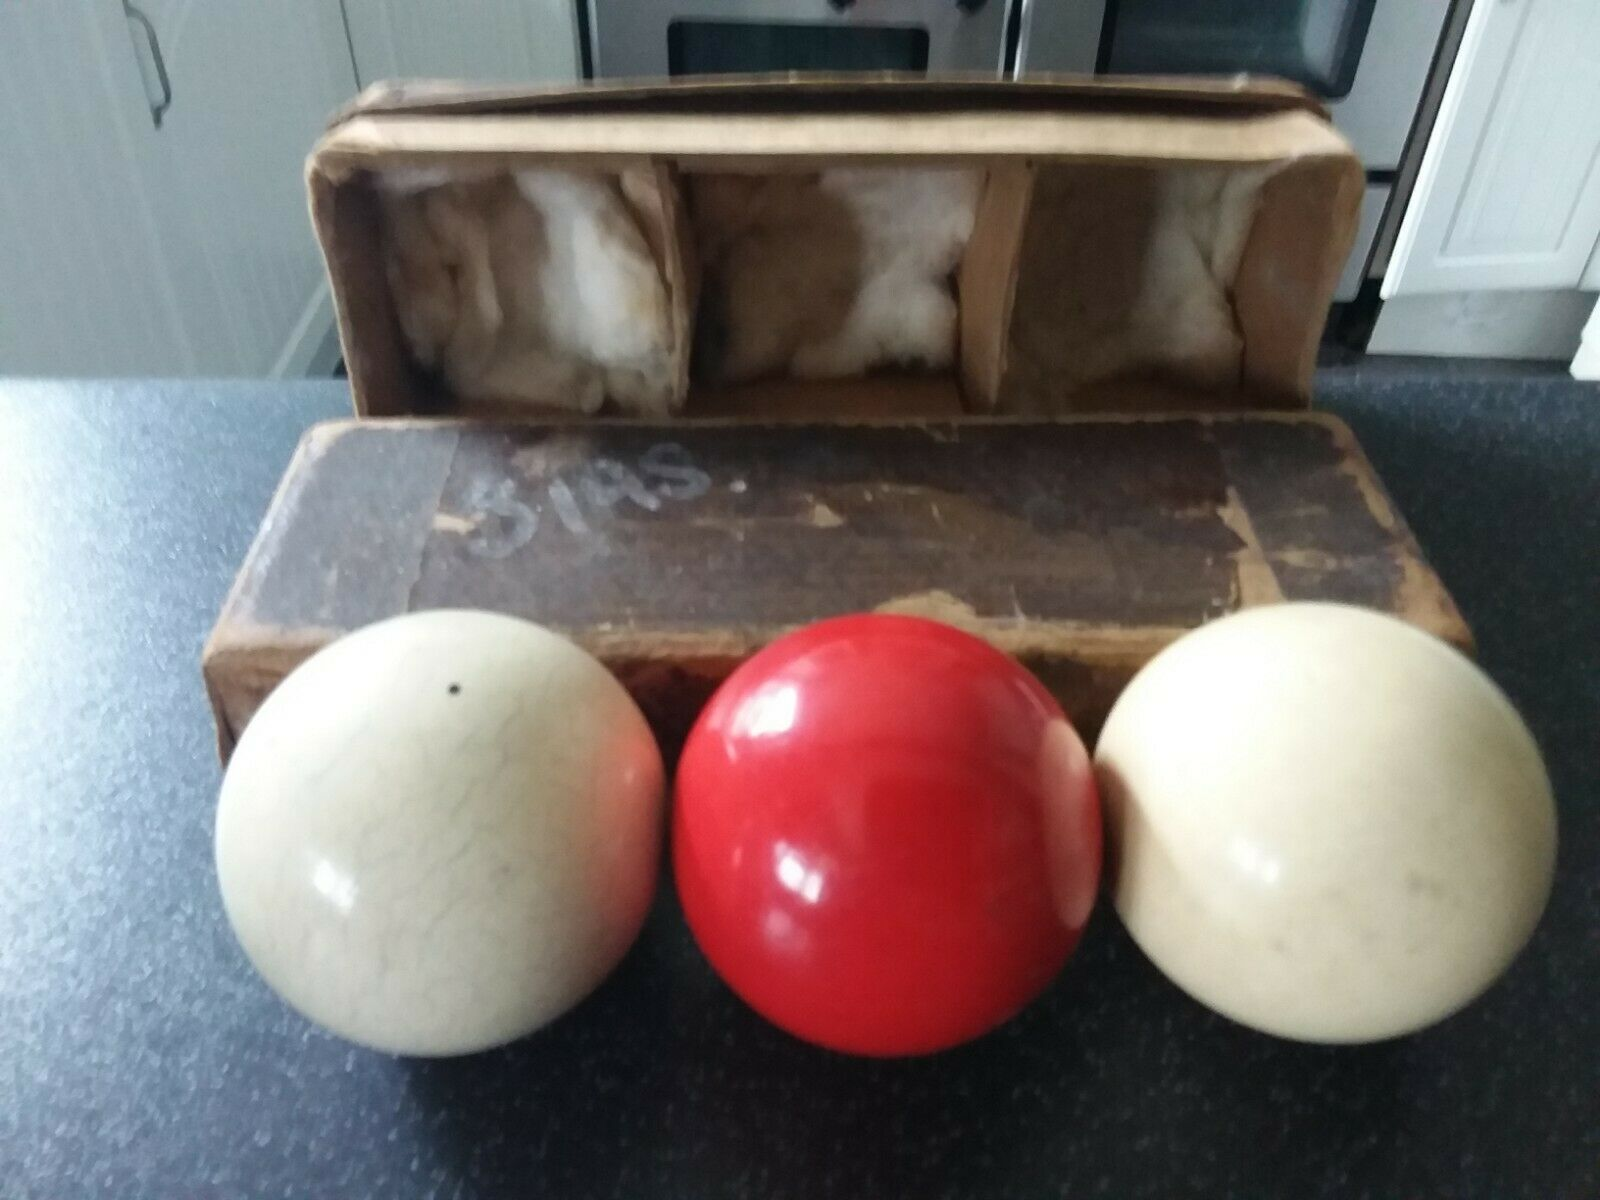 SET OF 3 VINTAGE BILLIARD/SNOOKER BALLS IN A BOX